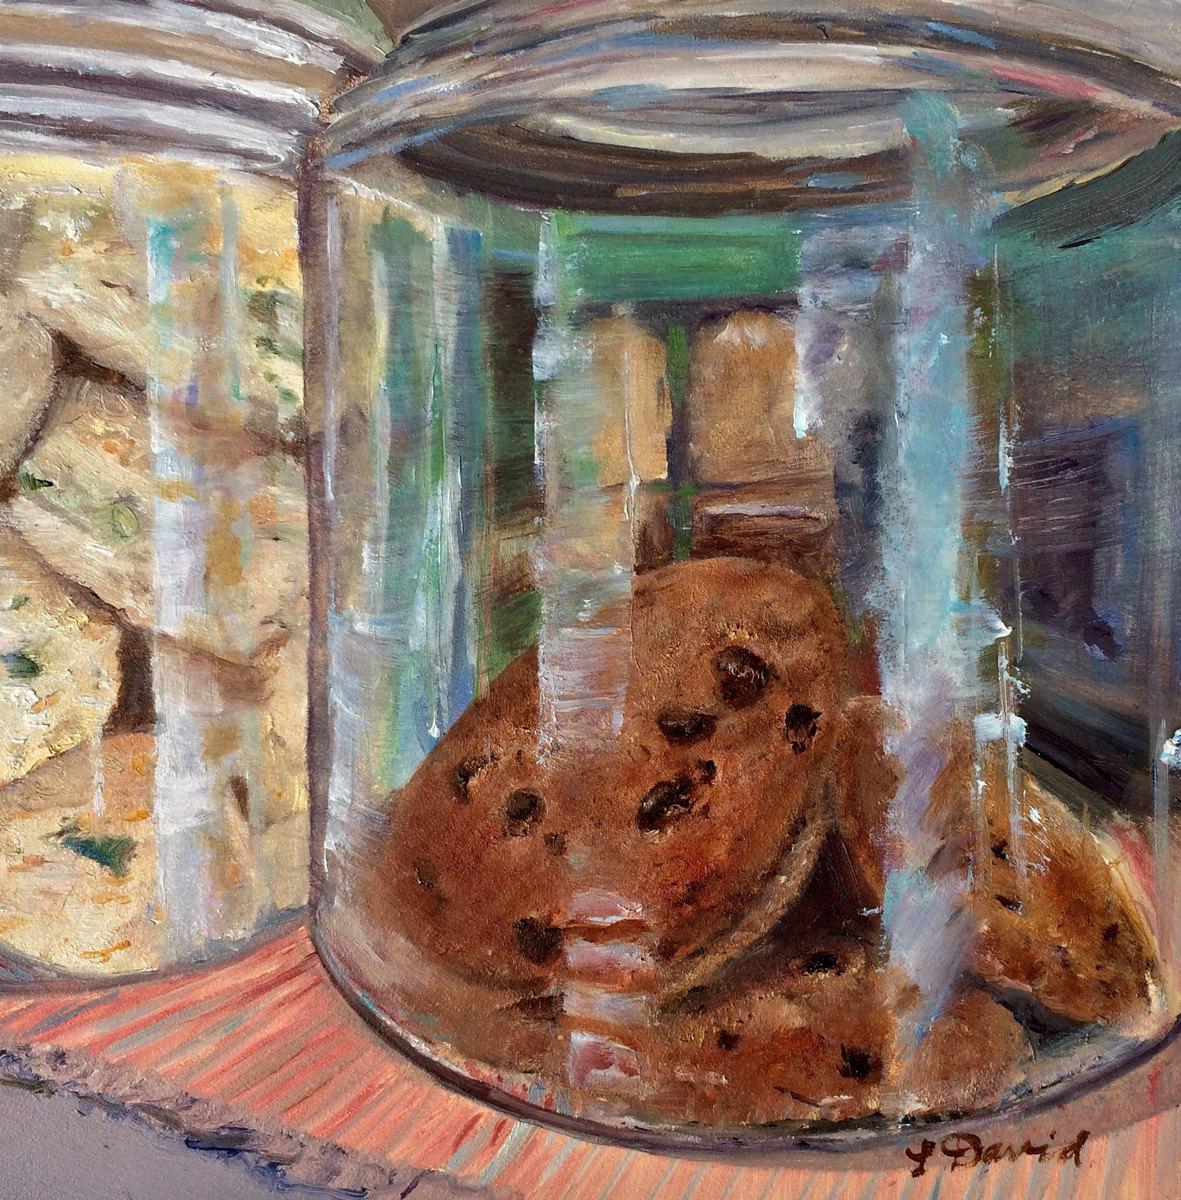 ADK Cookies (large view)